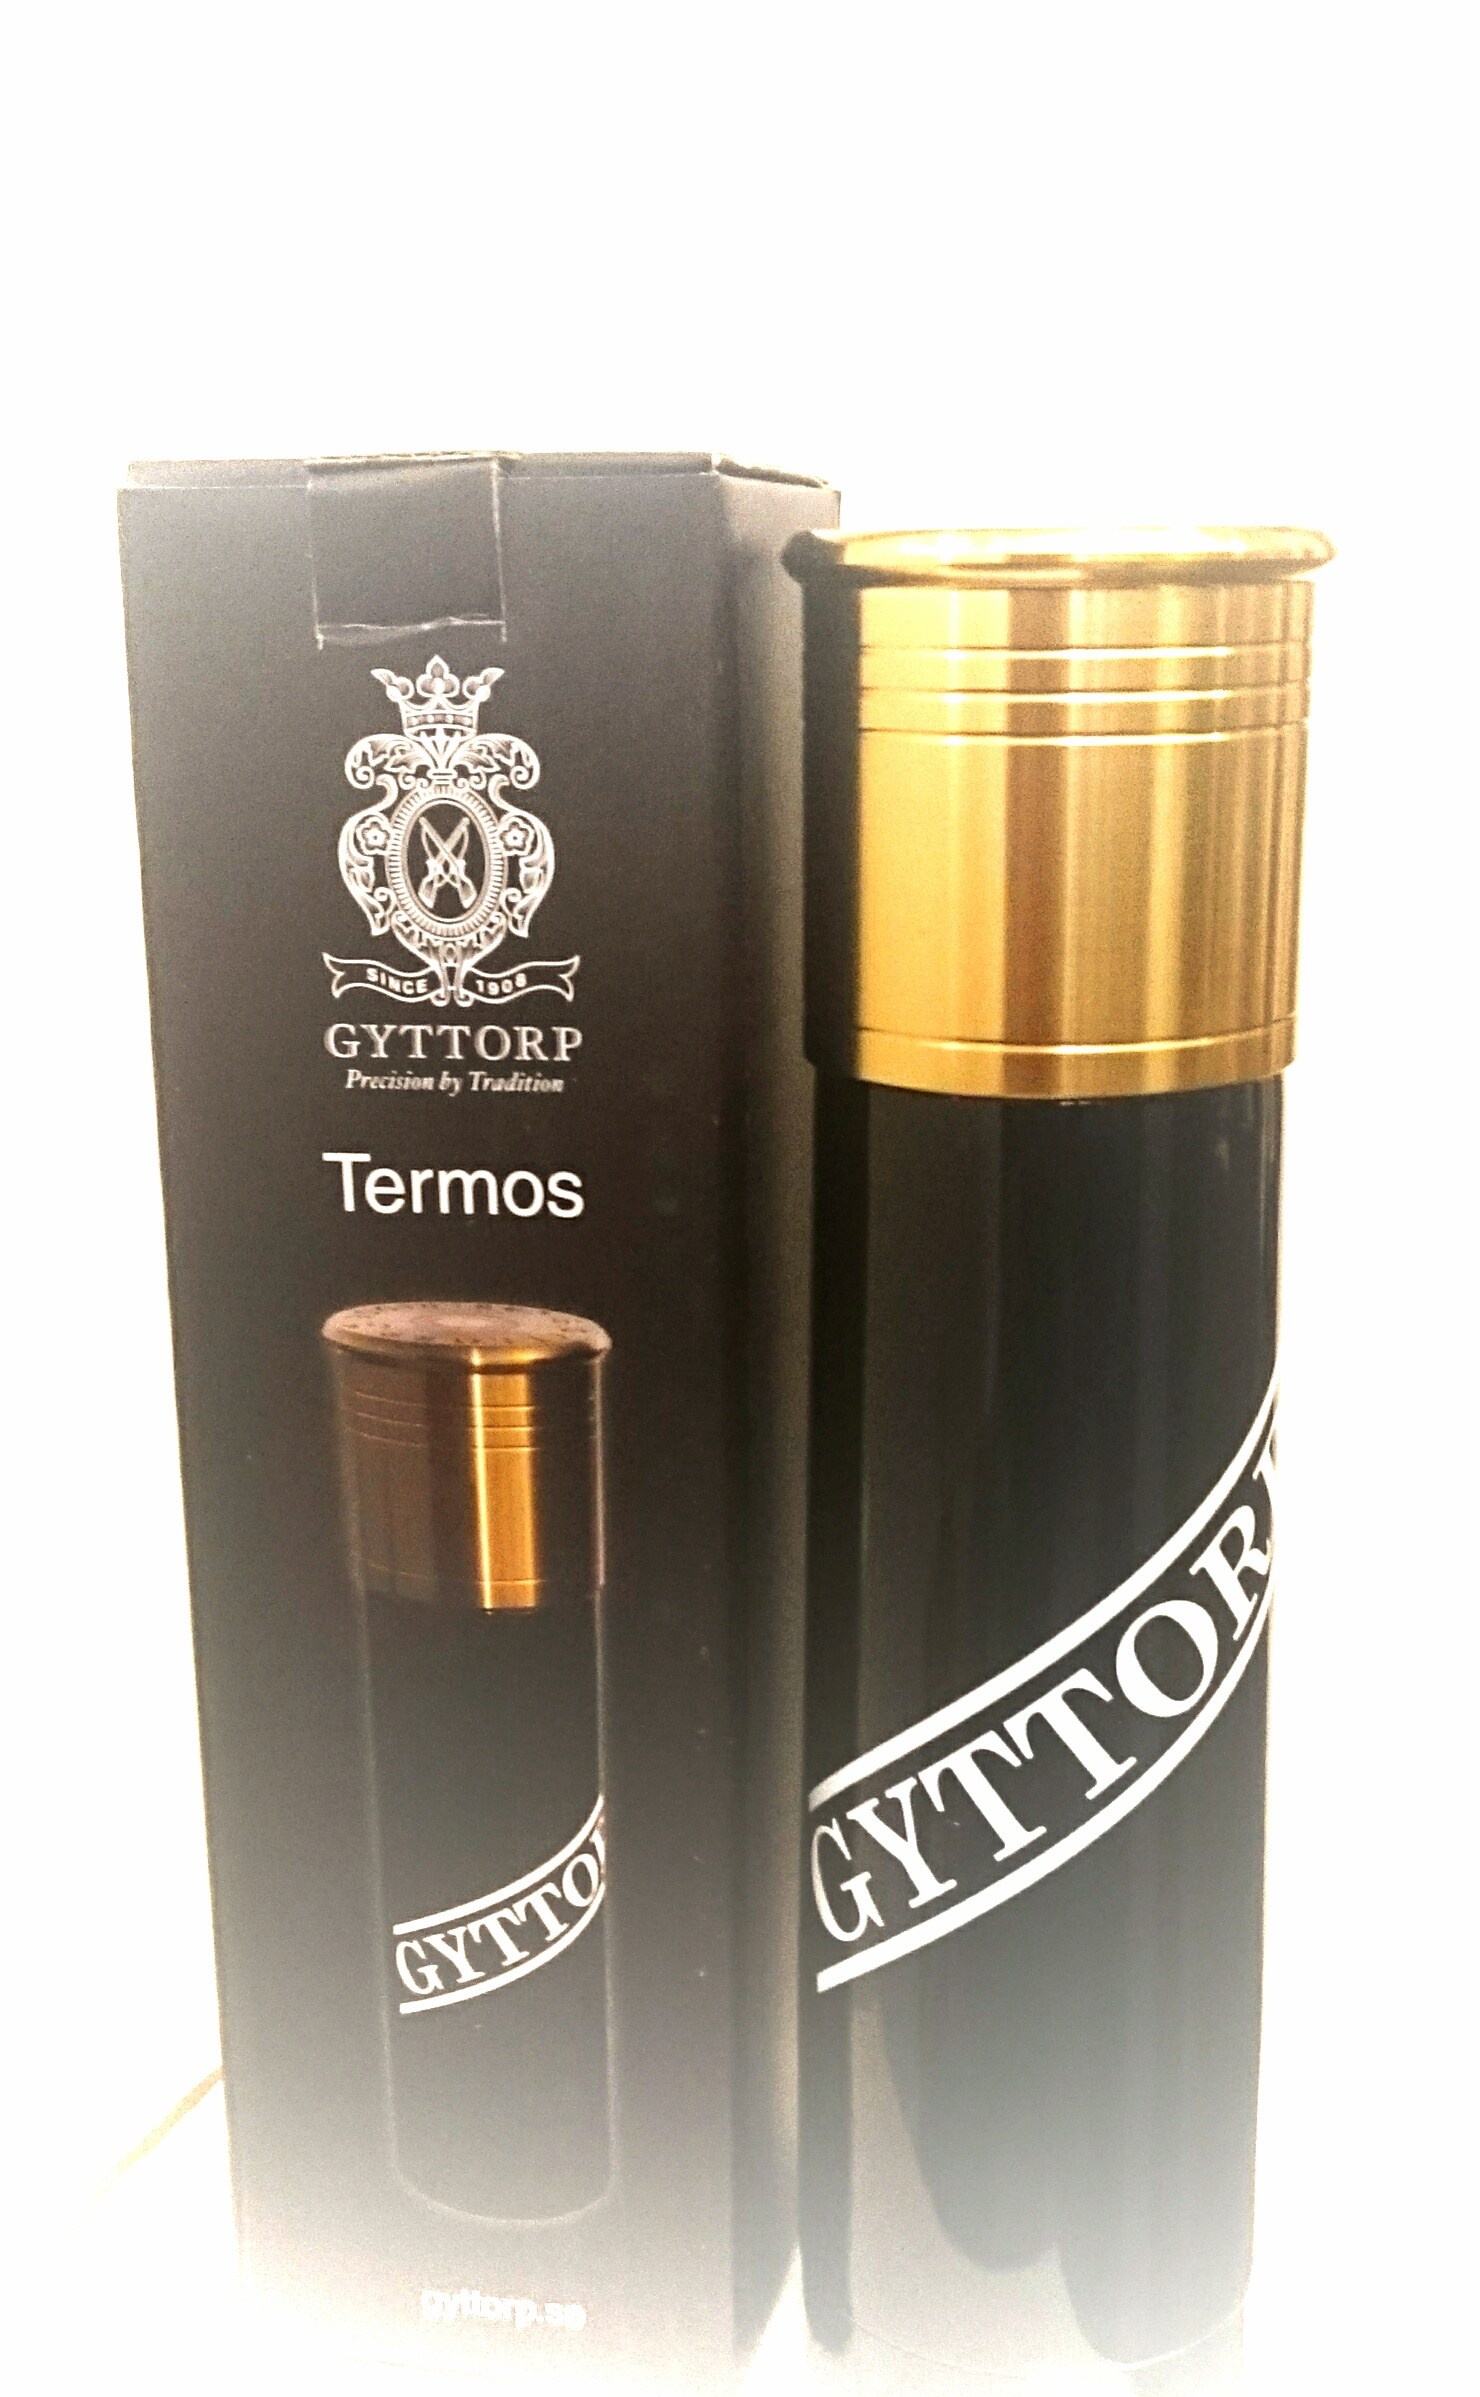 Termos Gyttorp 05l